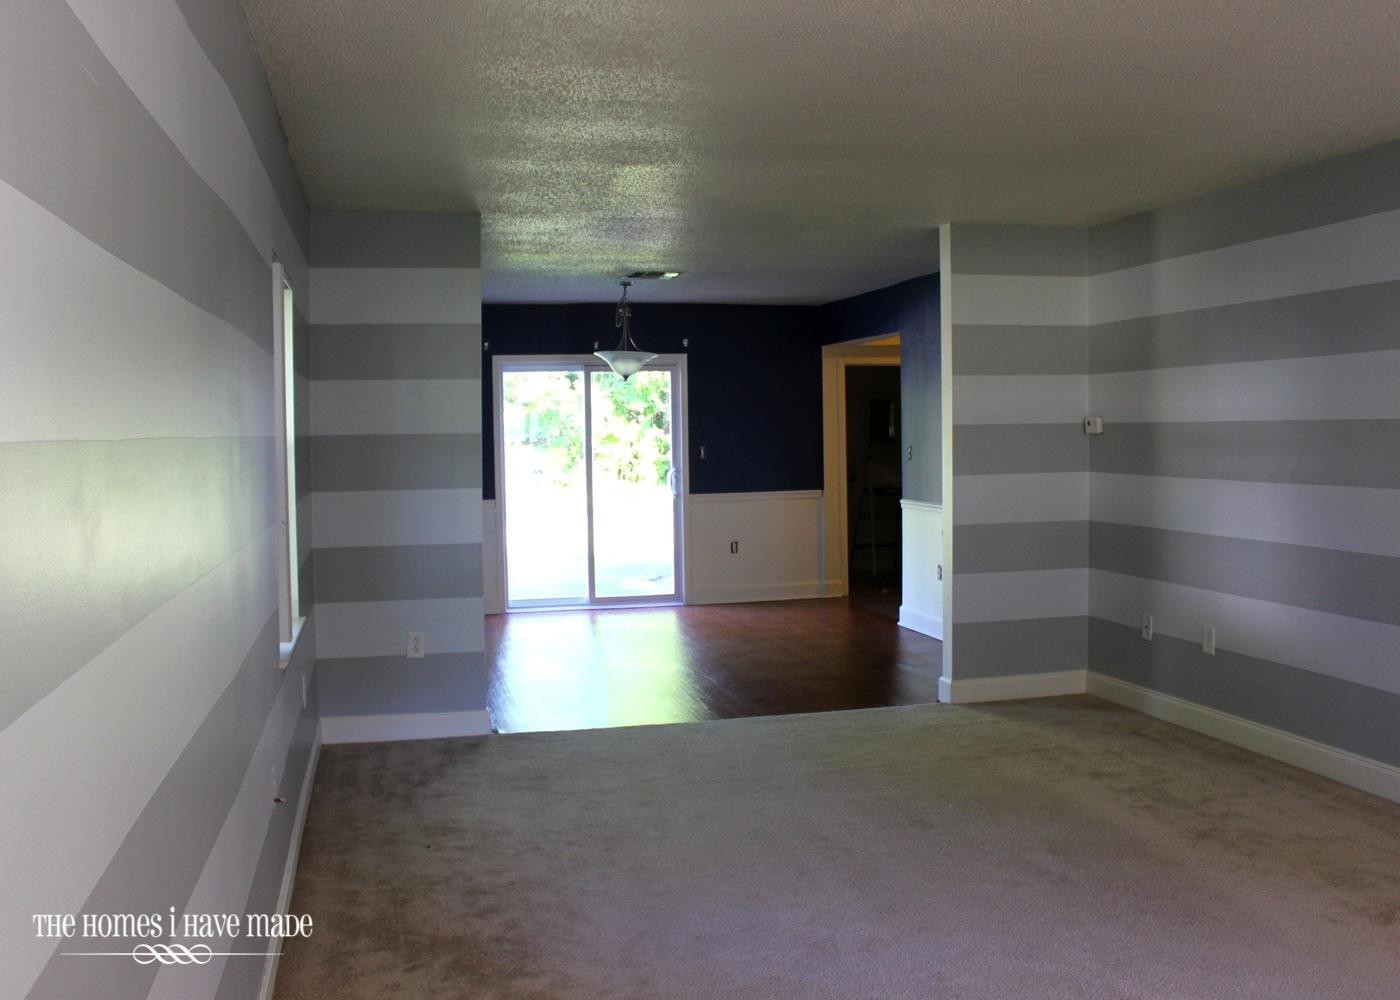 ideas for lighting a rental [ 1400 x 1000 Pixel ]